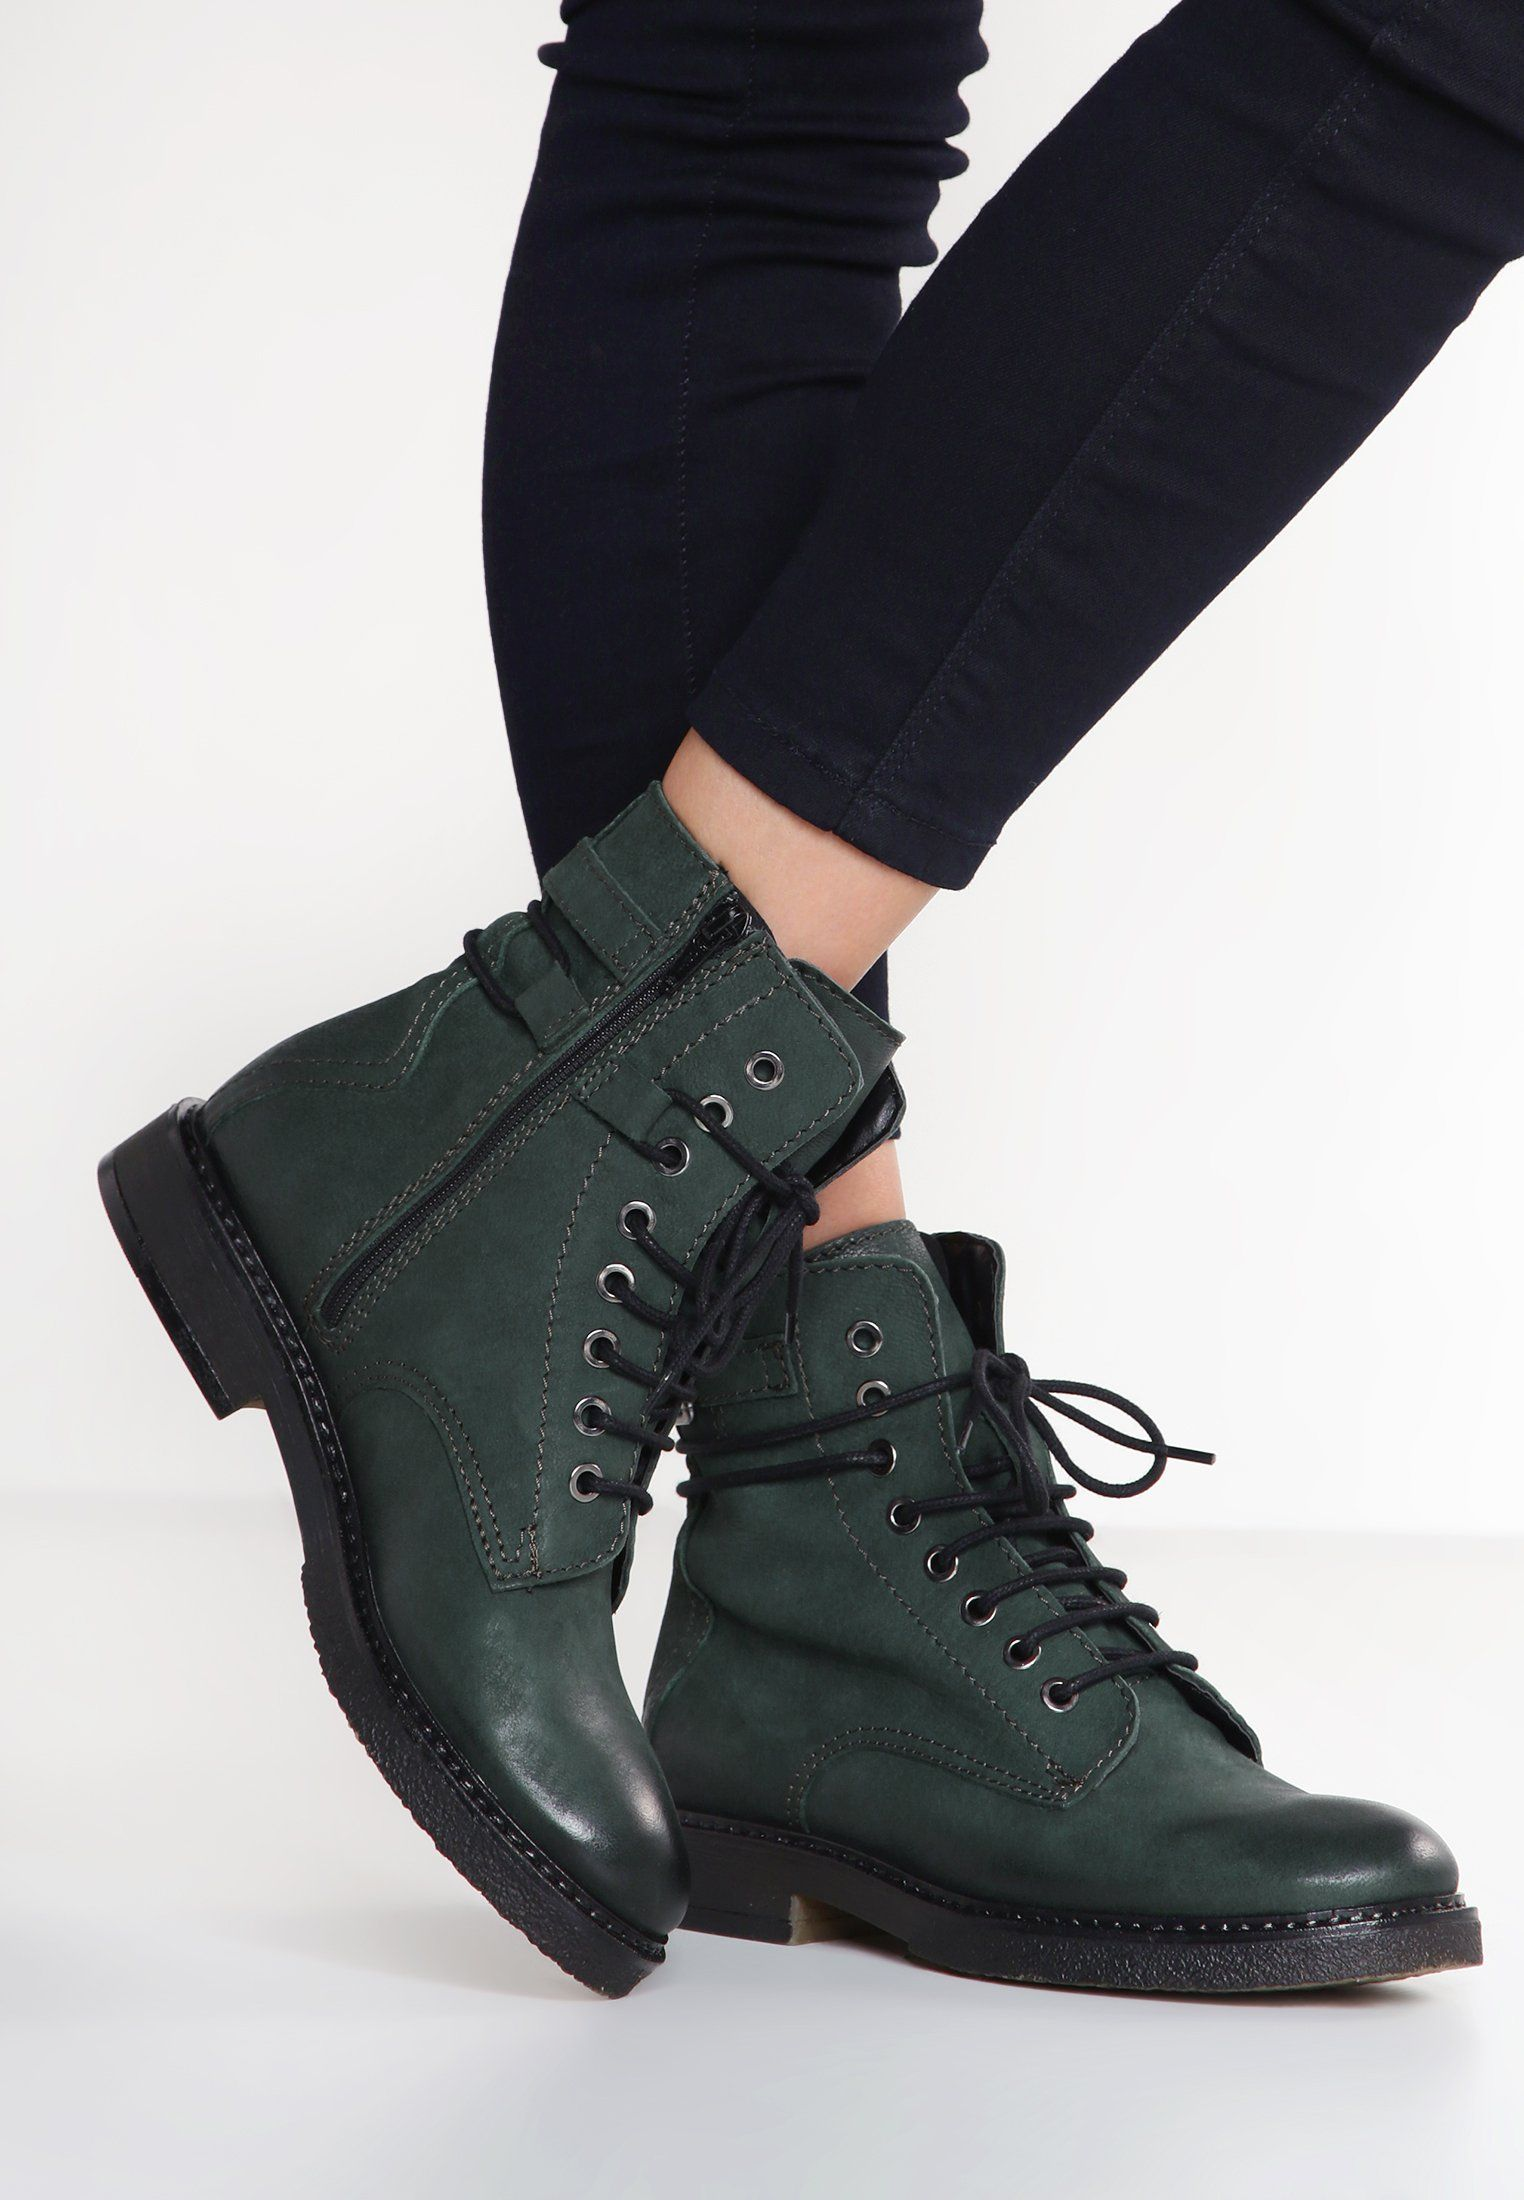 Tamaris Boots   Boots, Shoes, Combat boots